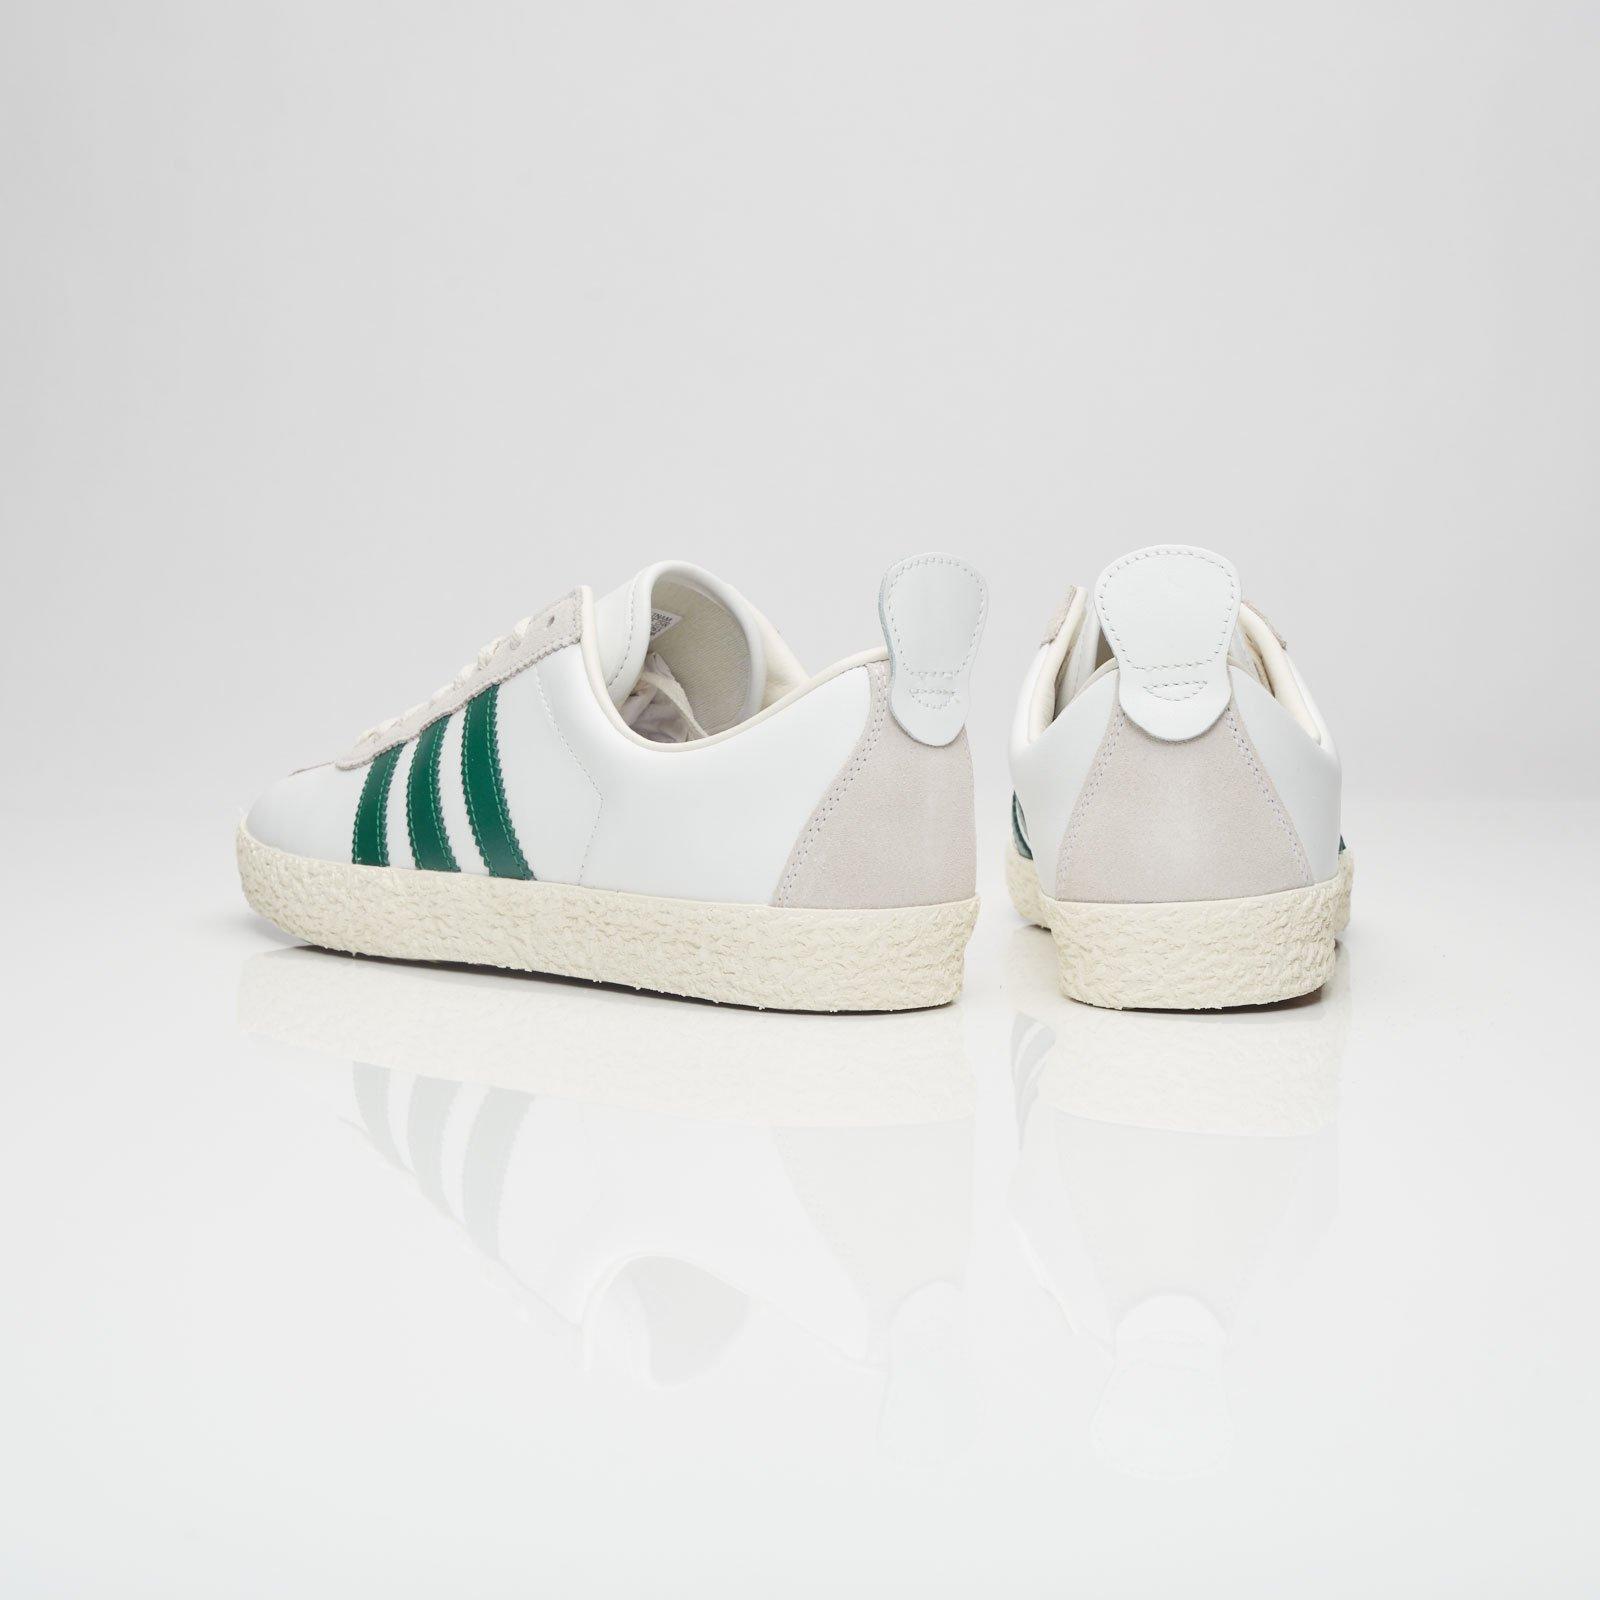 buy online dafa7 6b3bb adidas Trainer - Ba7877 - Sneakersnstuff   sneakers   streetwear online  since 1999